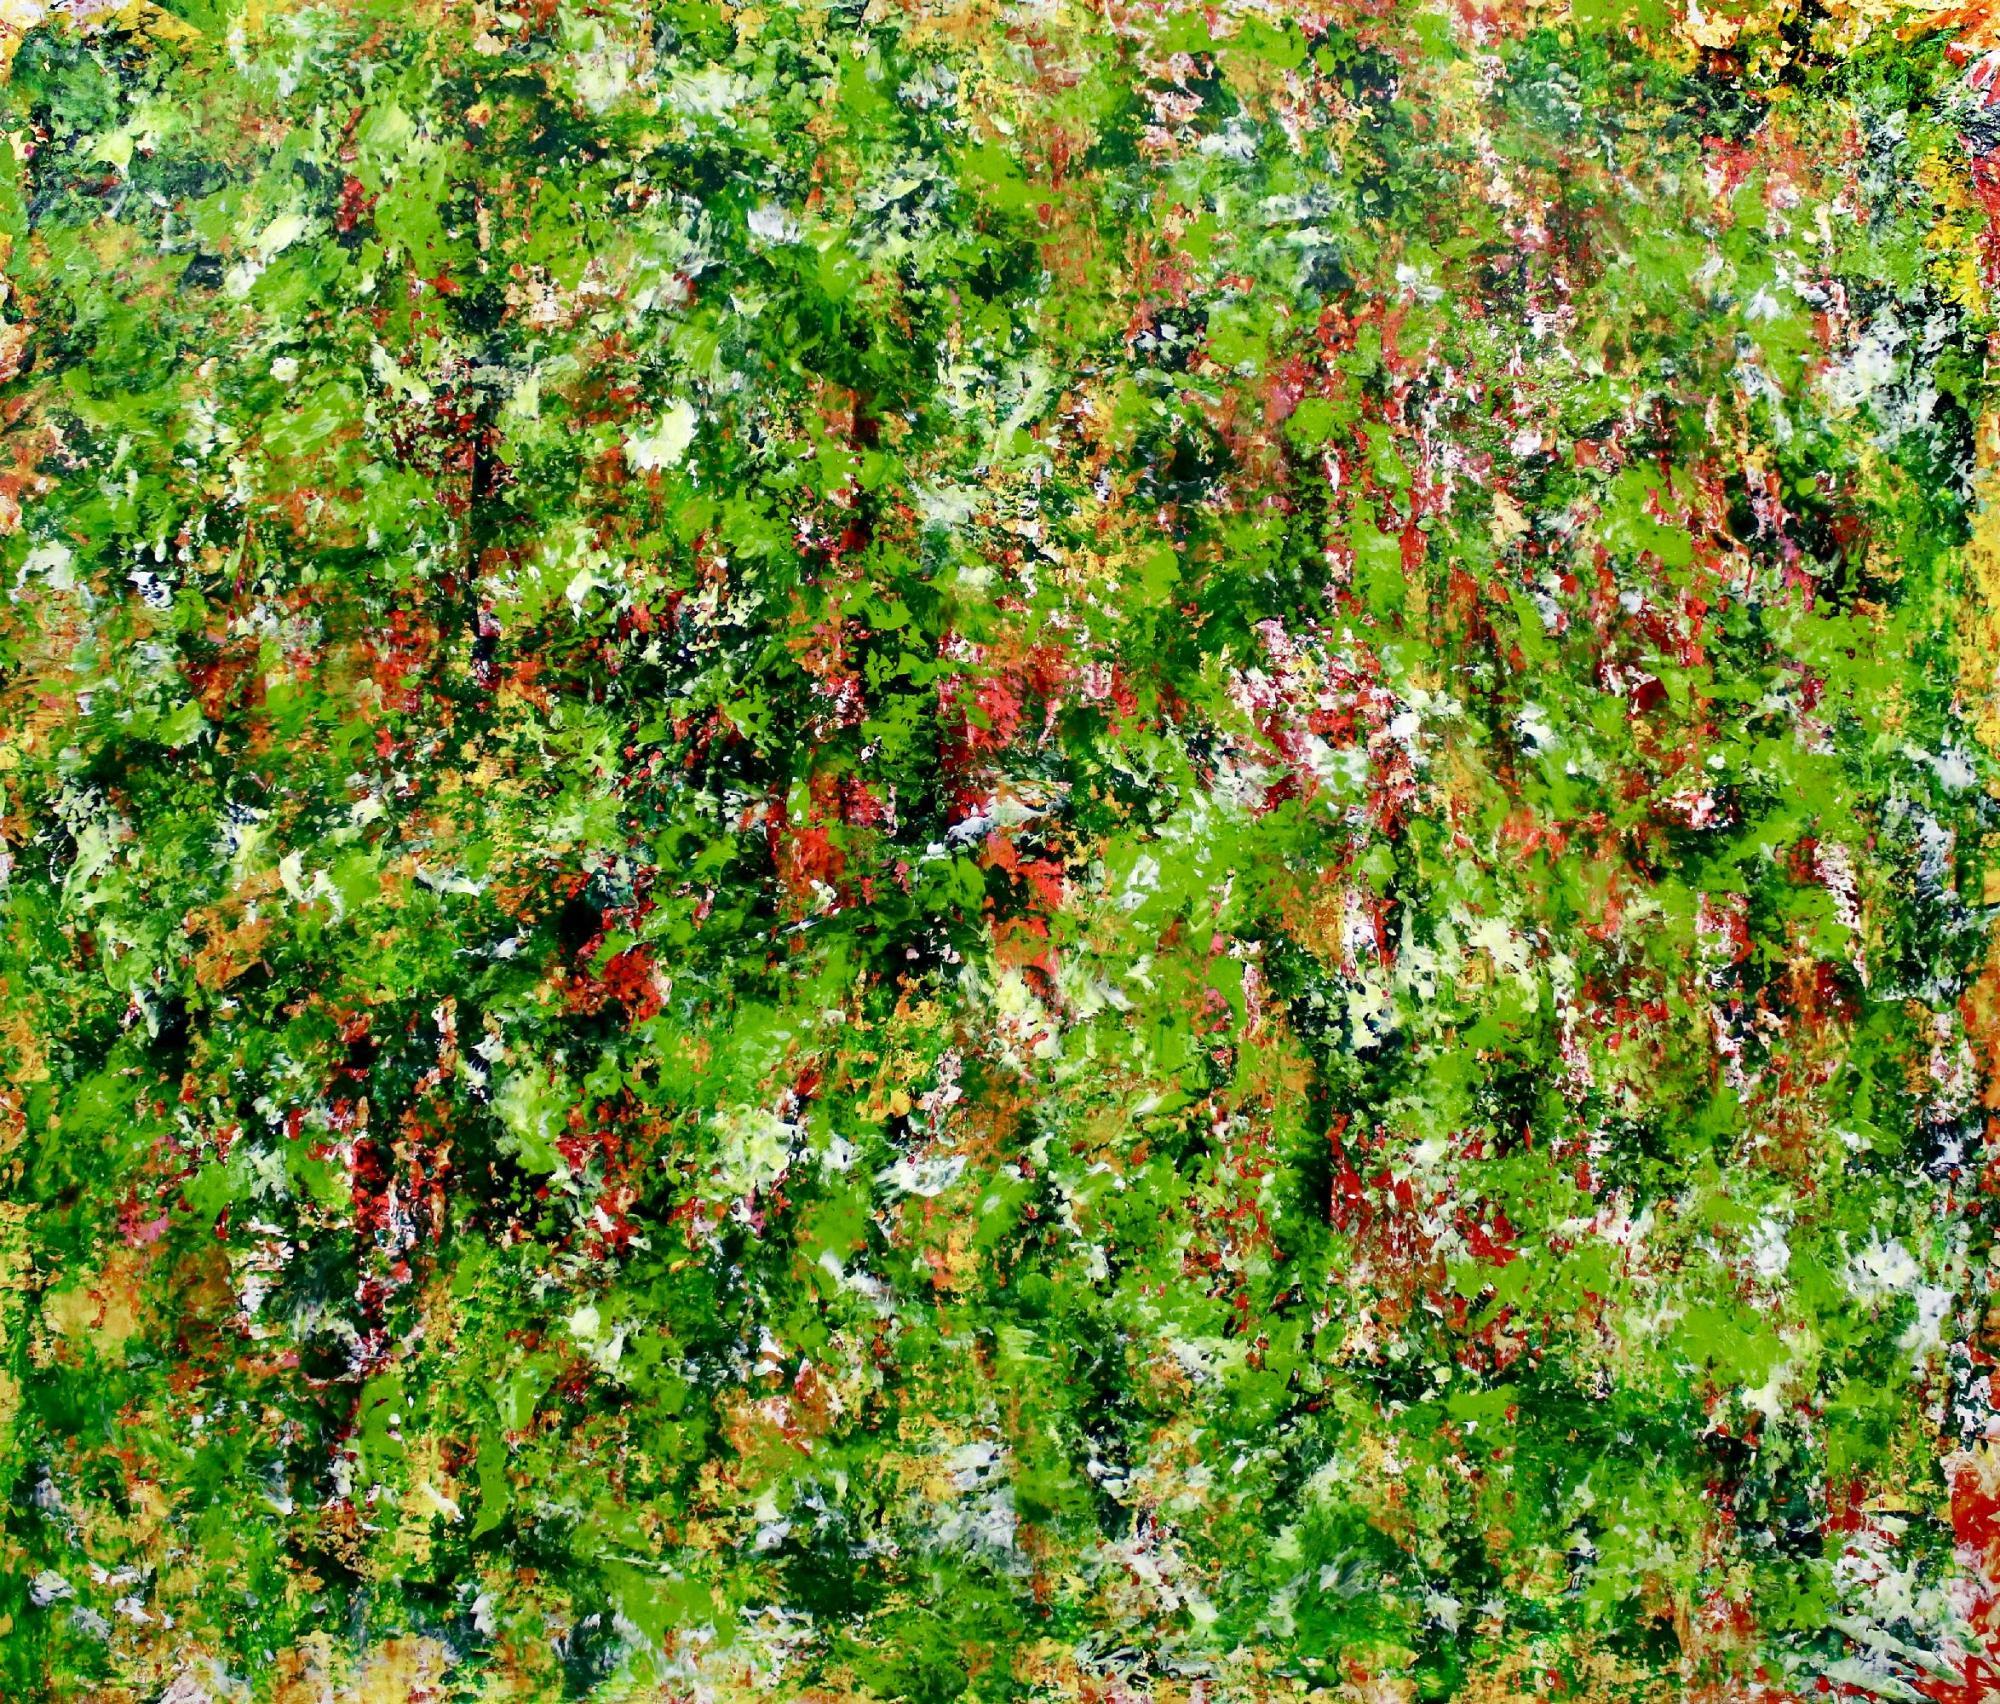 Verdor ( Green Regrowth) 2020 by Nestor Toro